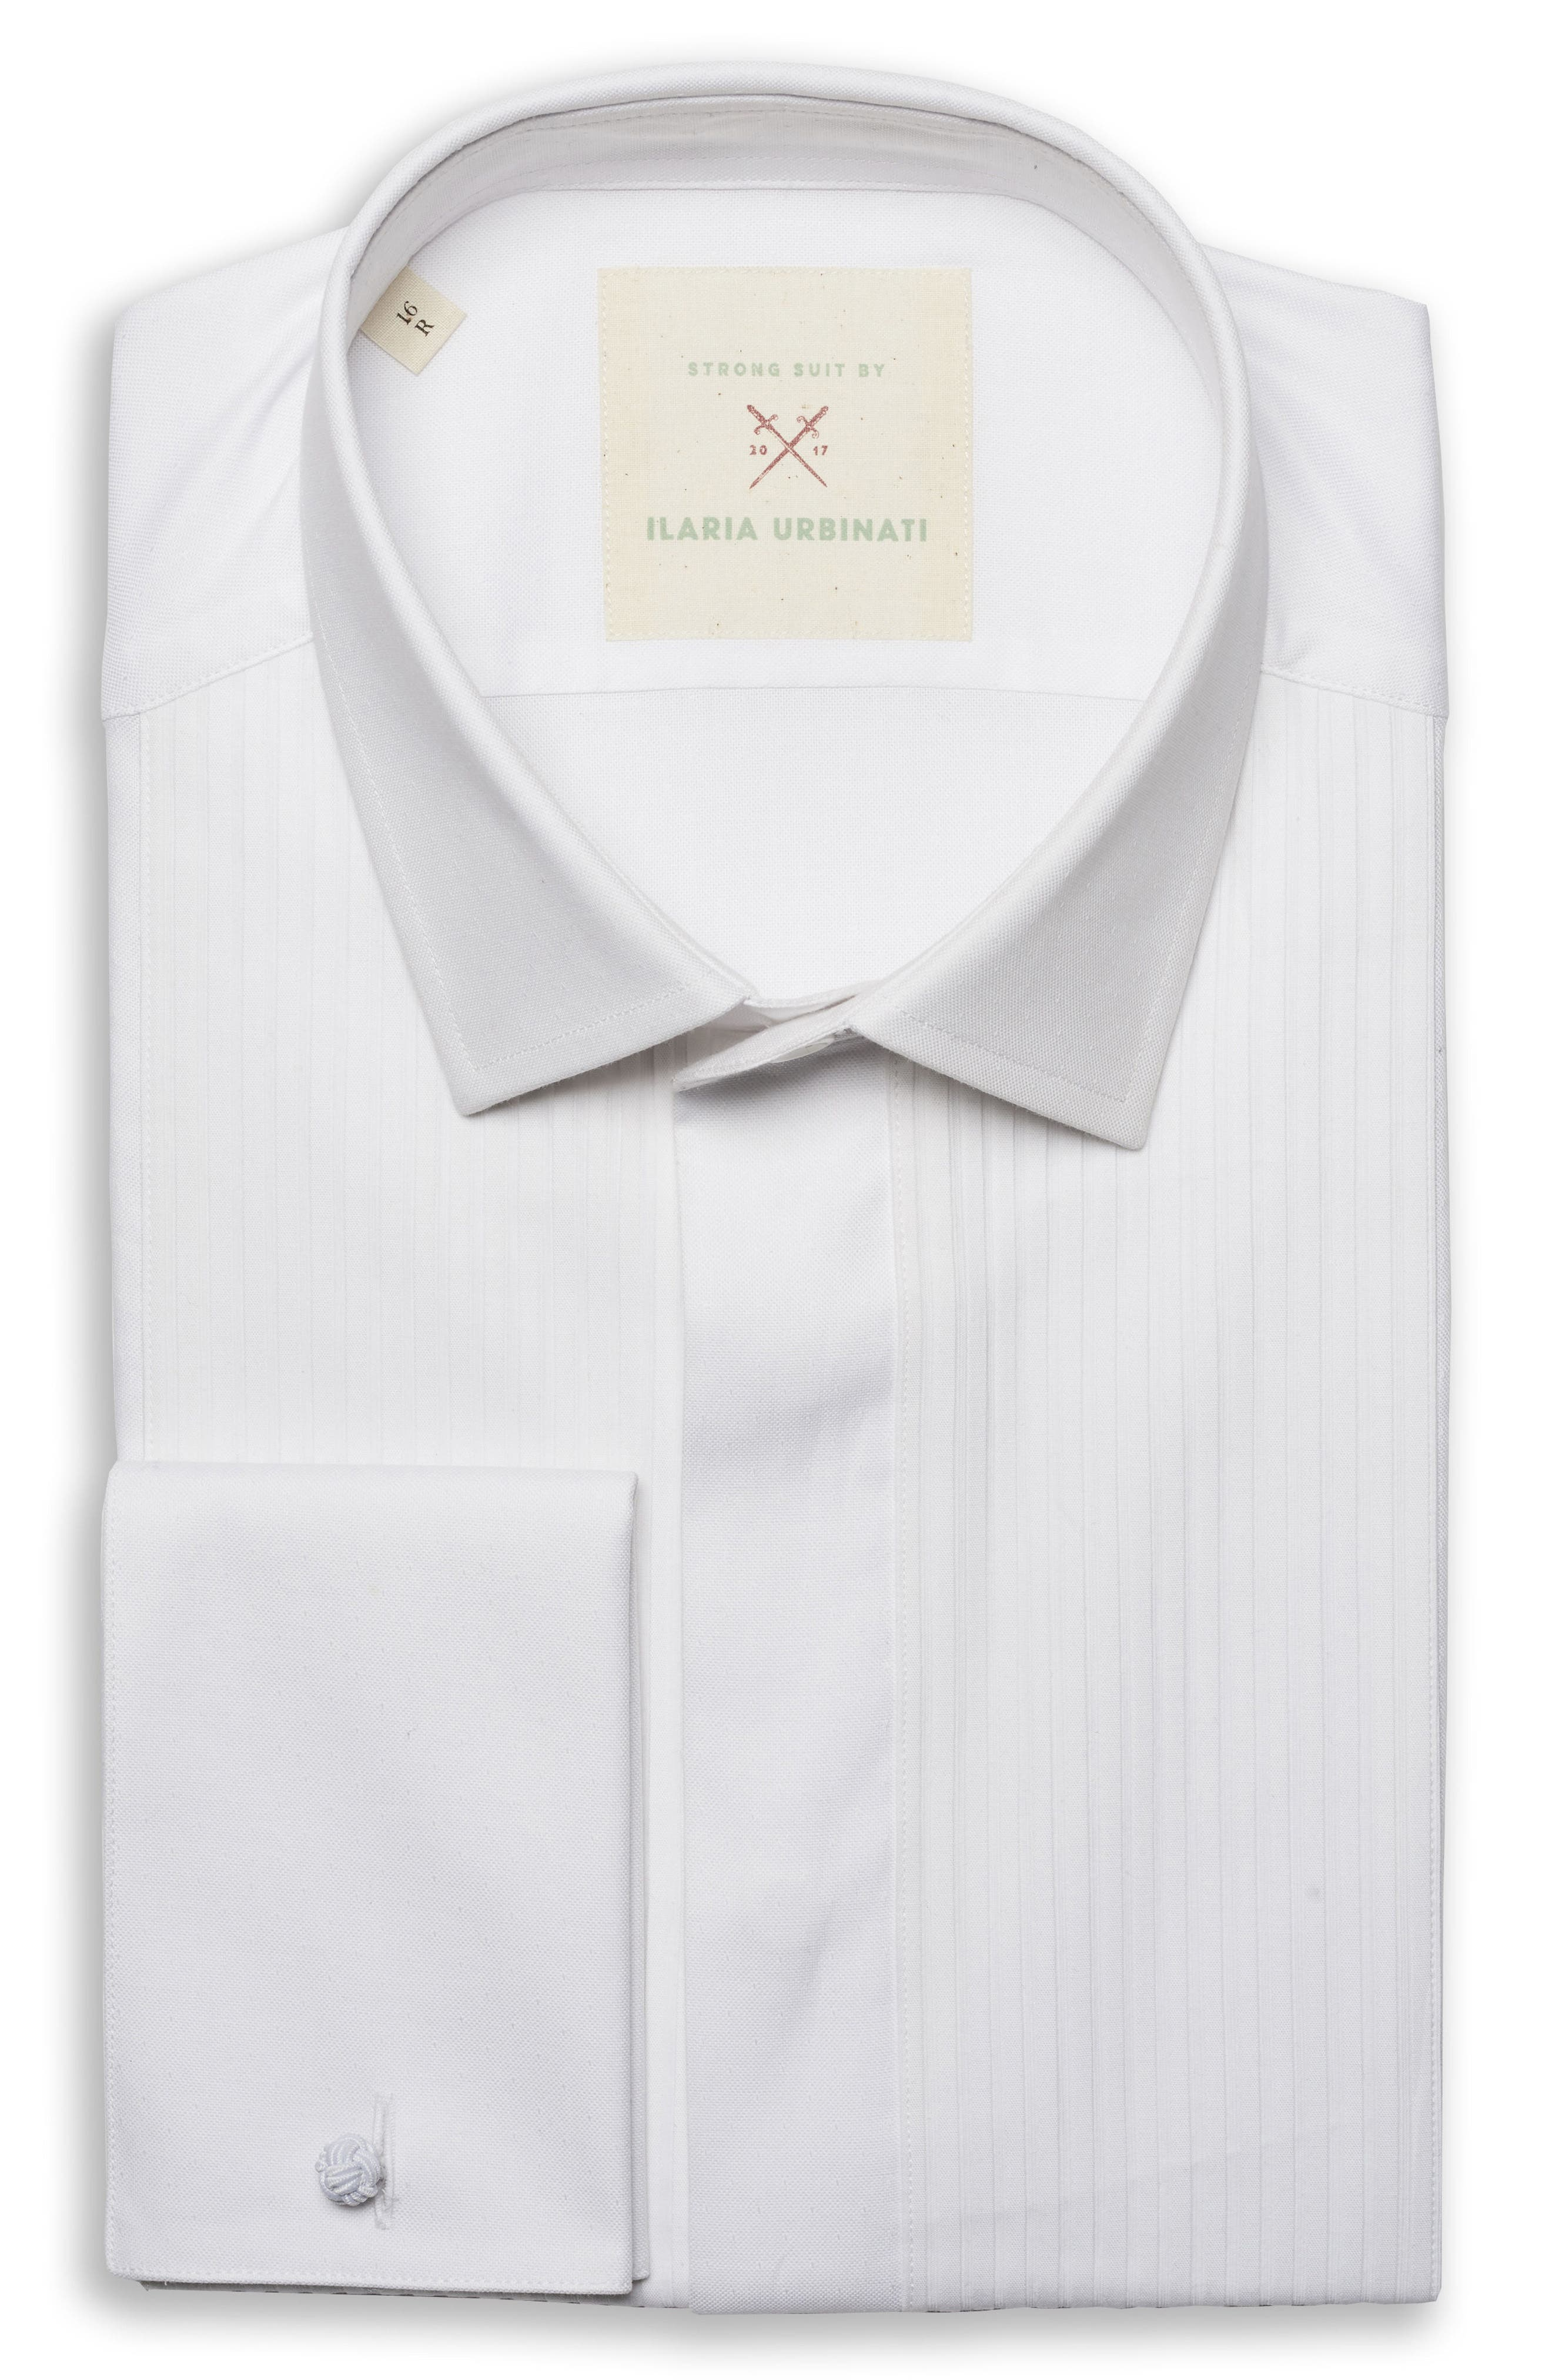 by Ilaria Urbinati Slim Fit Tuxedo Shirt,                             Main thumbnail 1, color,                             White